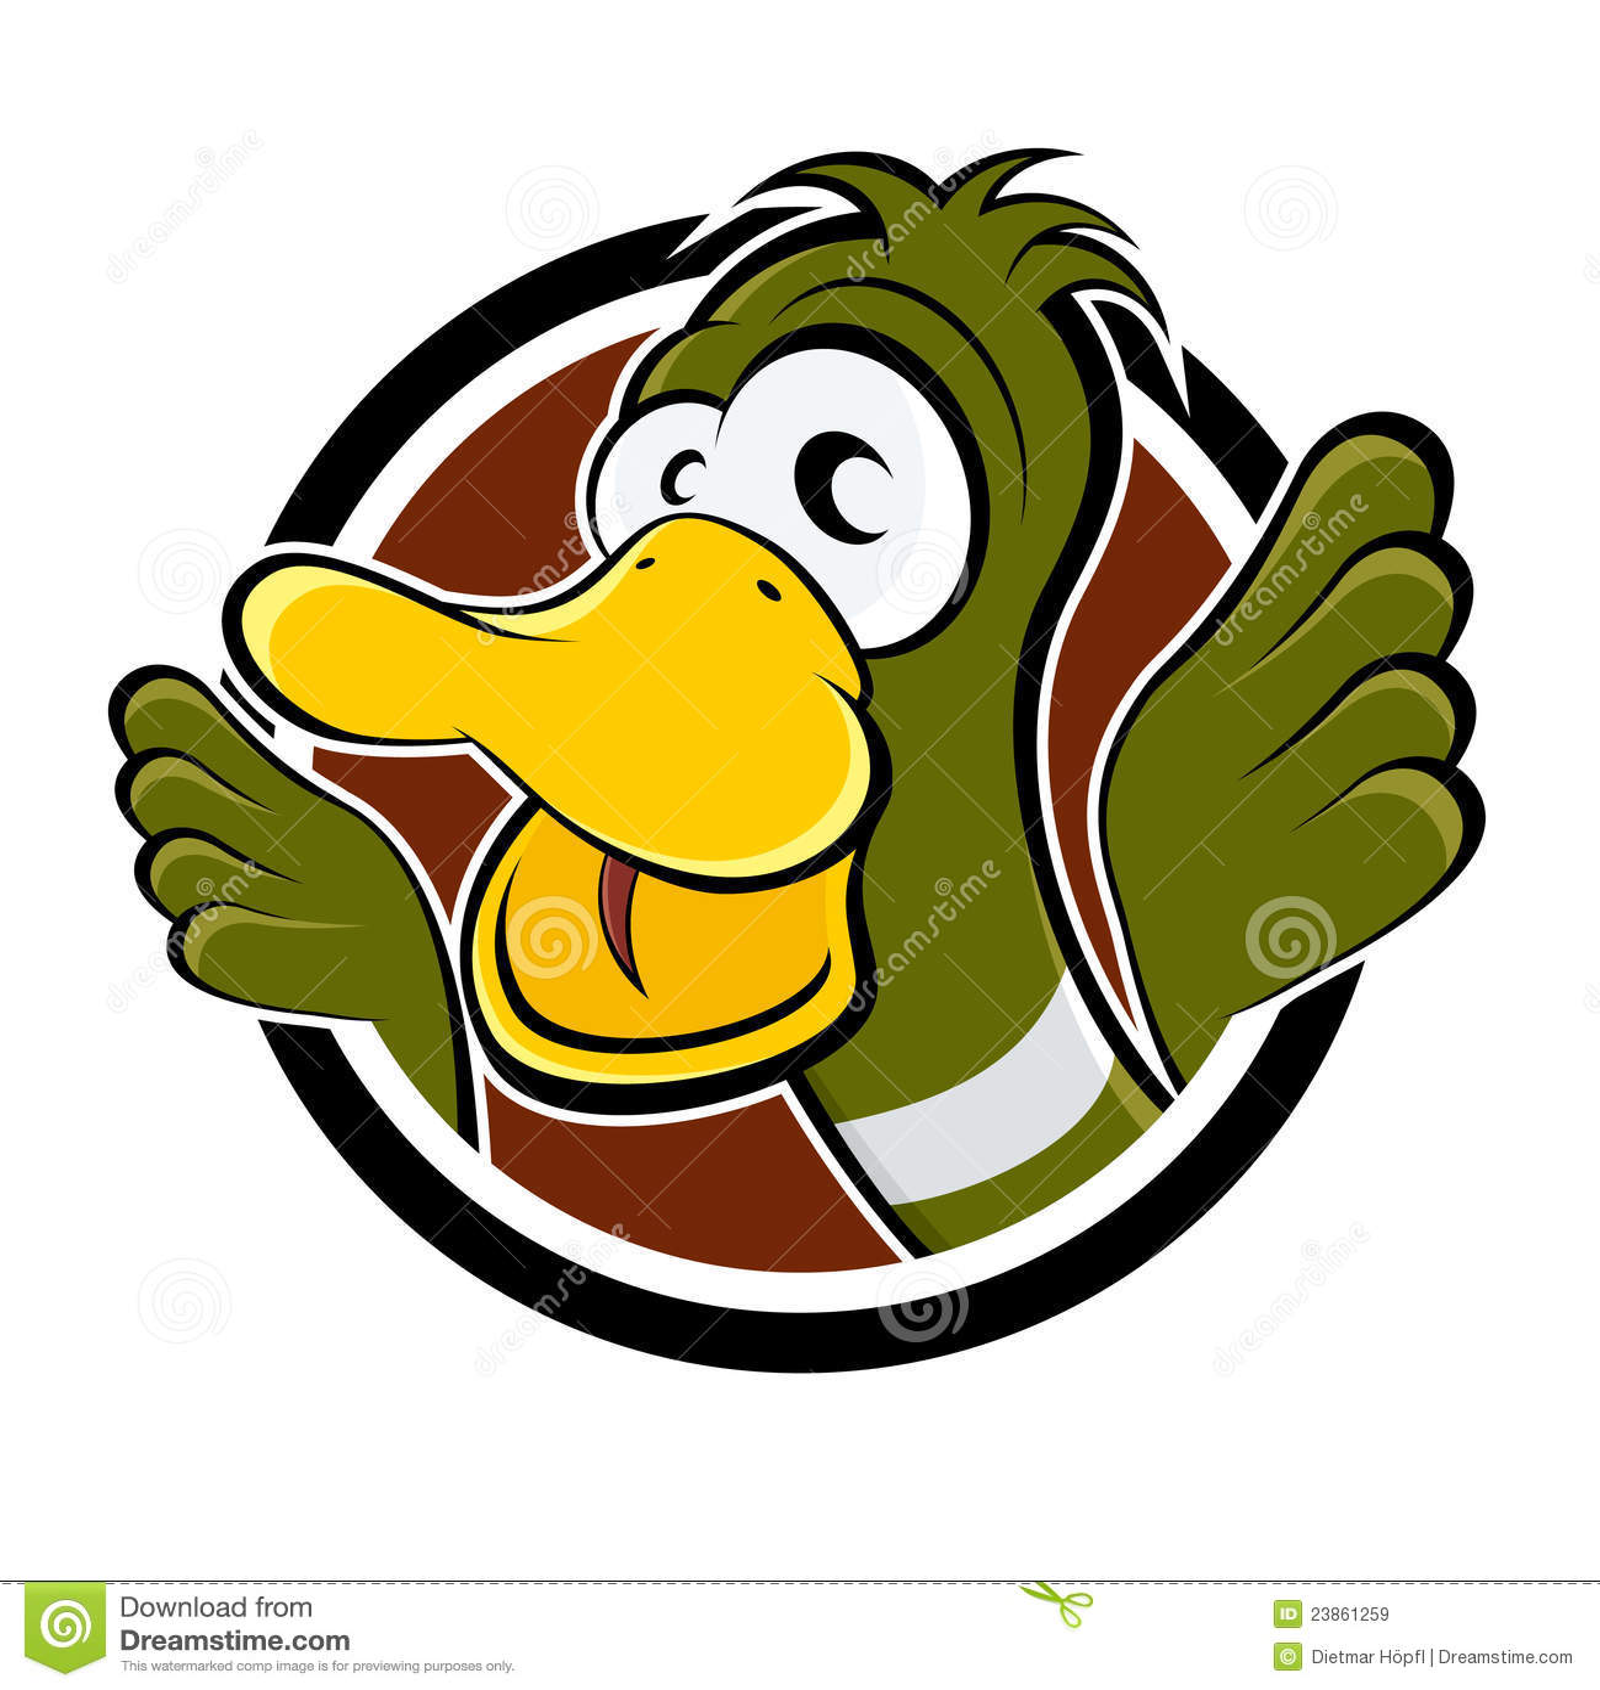 Funny cartoon duck stock vector. Image of animal, cute ...